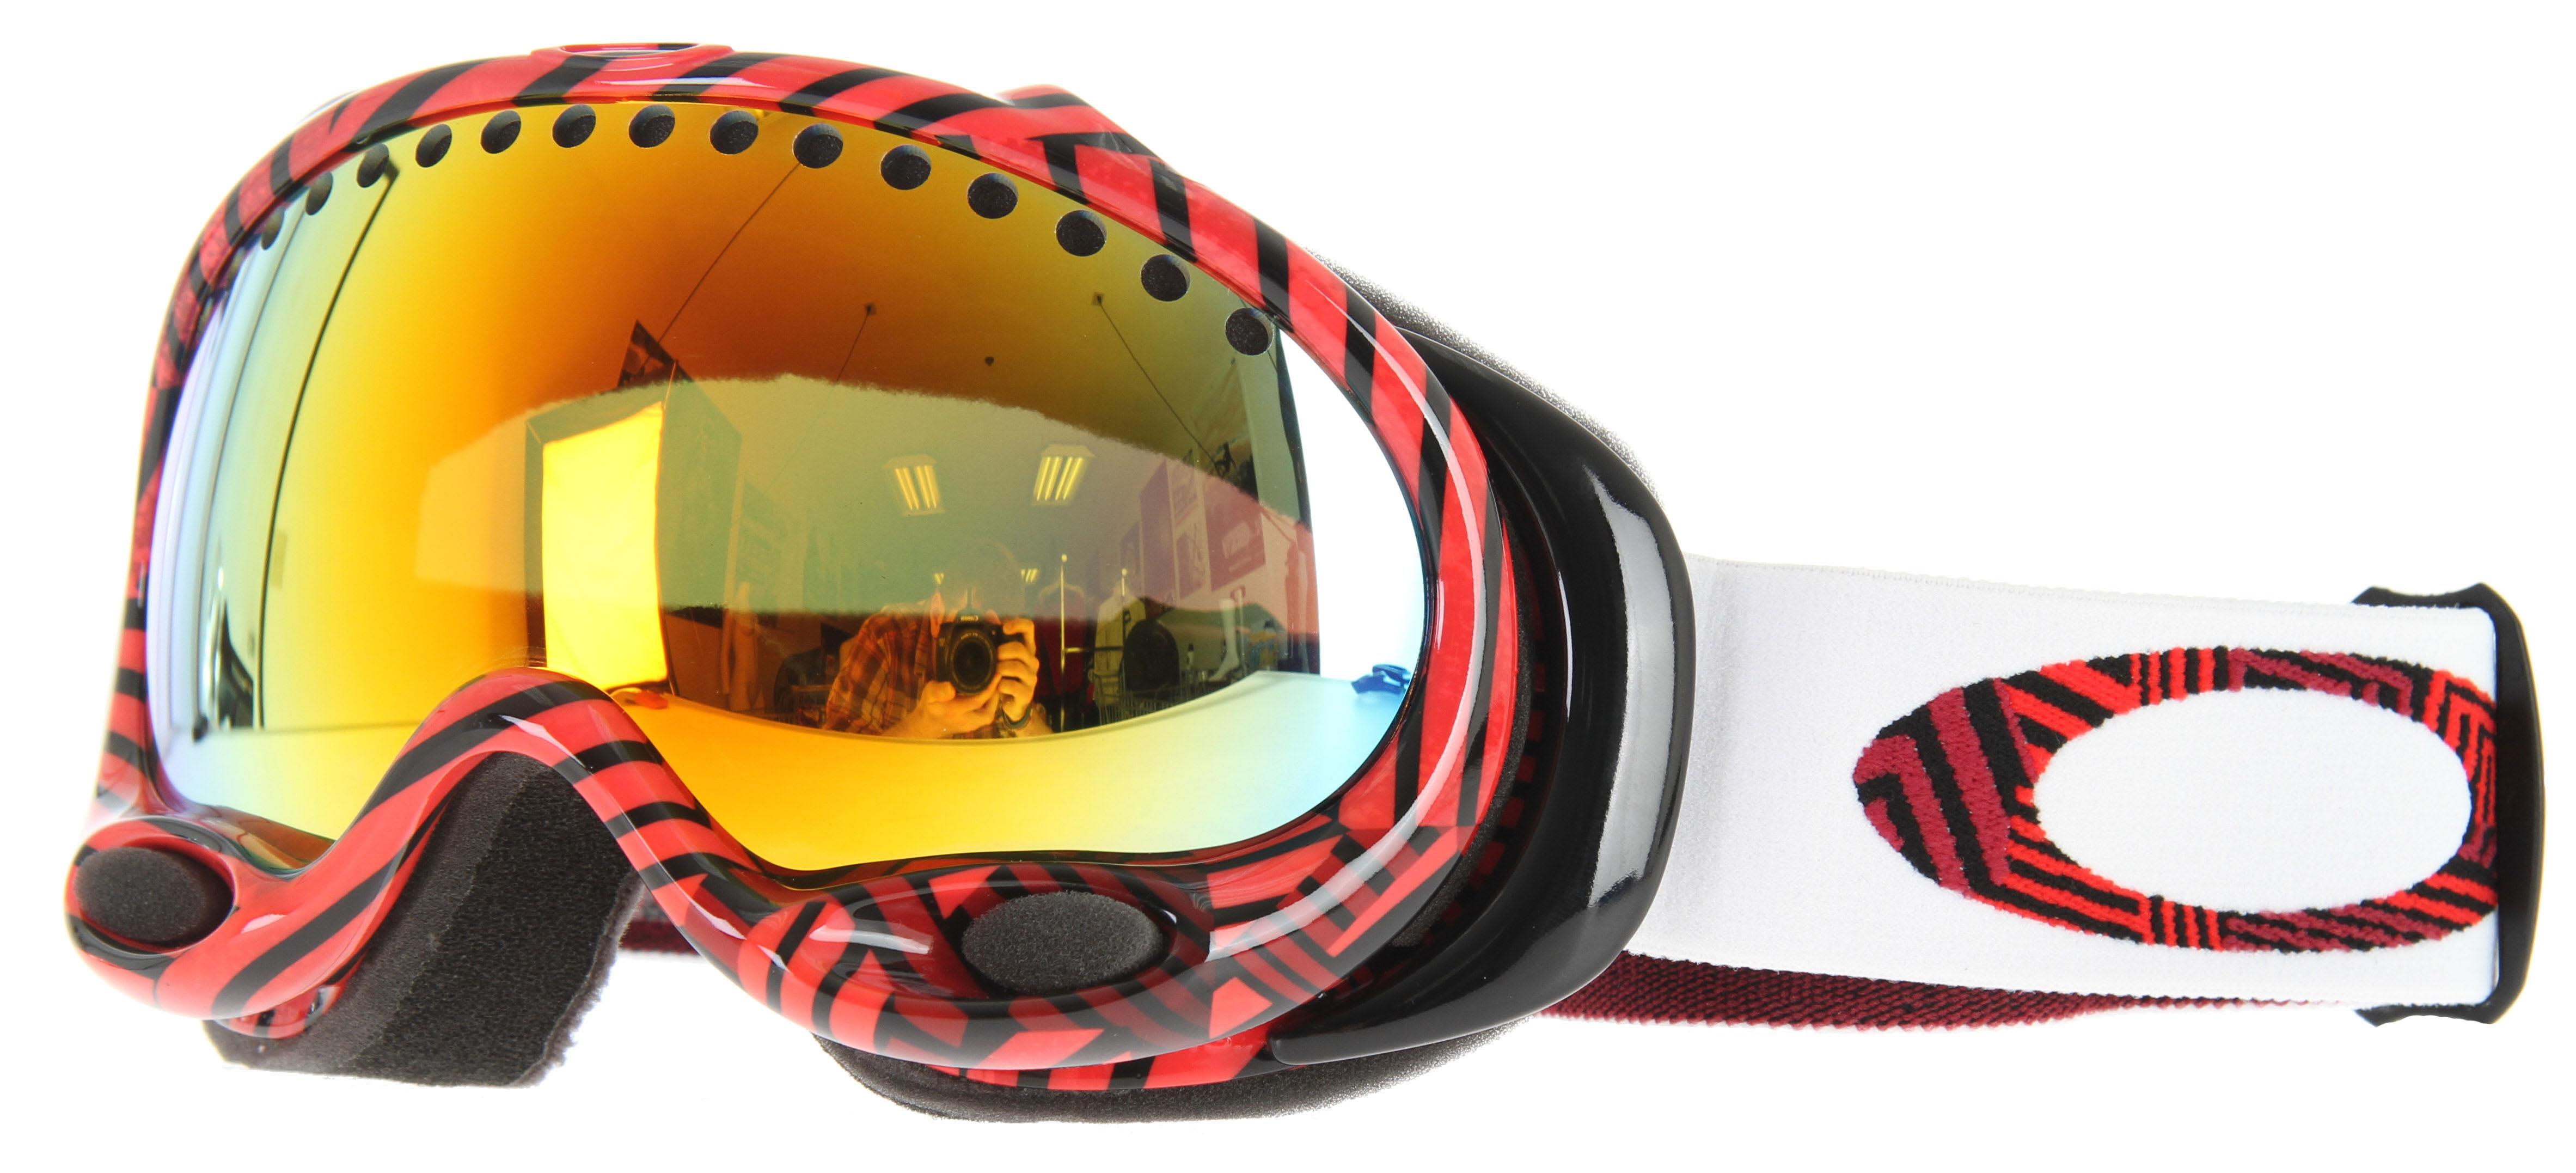 0a6458bcb1 Oakley Shaun White Signature Series Airbrake Snow Goggle « One More Soul